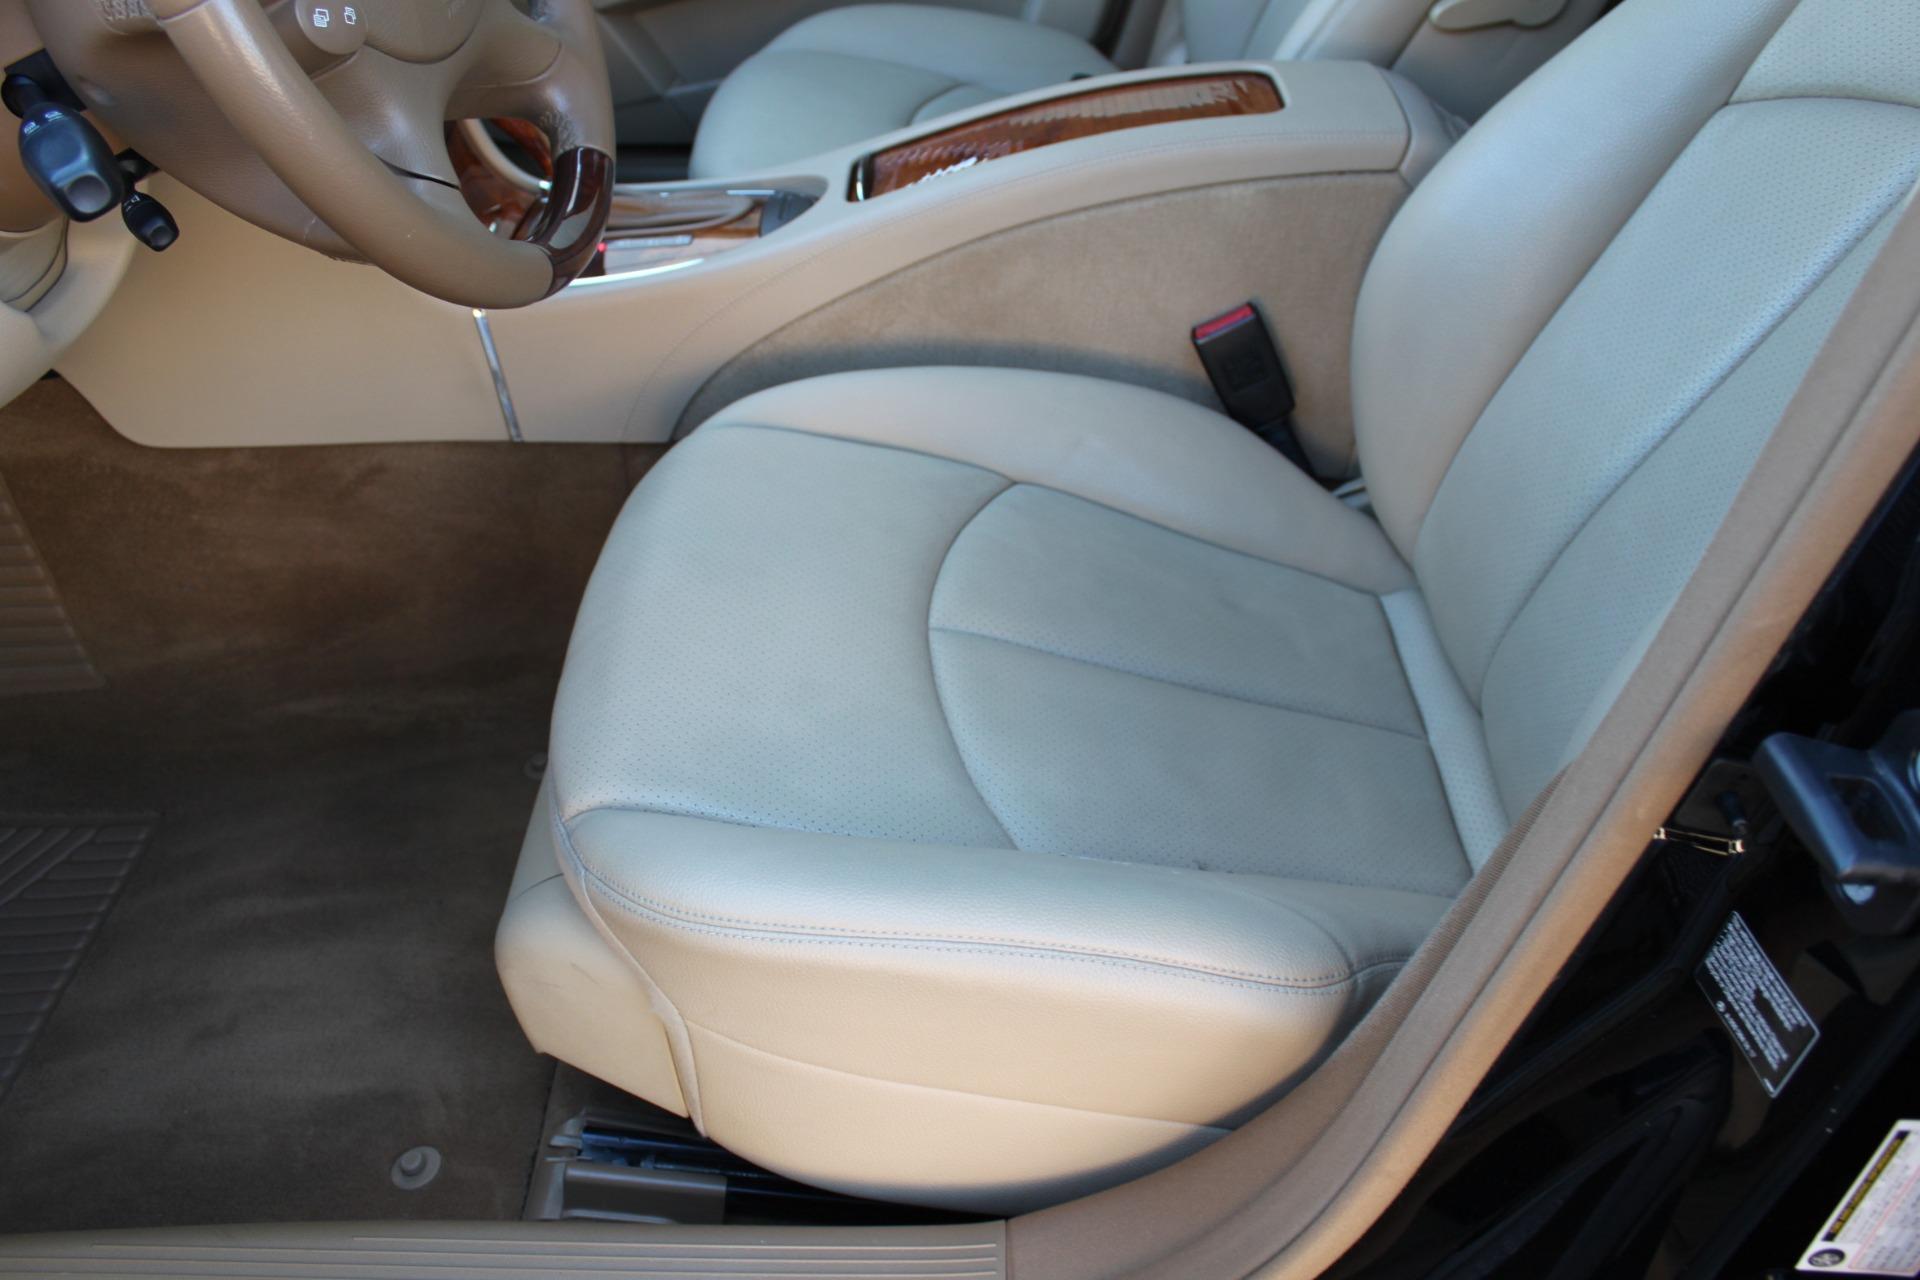 Used-2009-Mercedes-Benz-E-Class-E320-30L-BlueTEC-Porsche